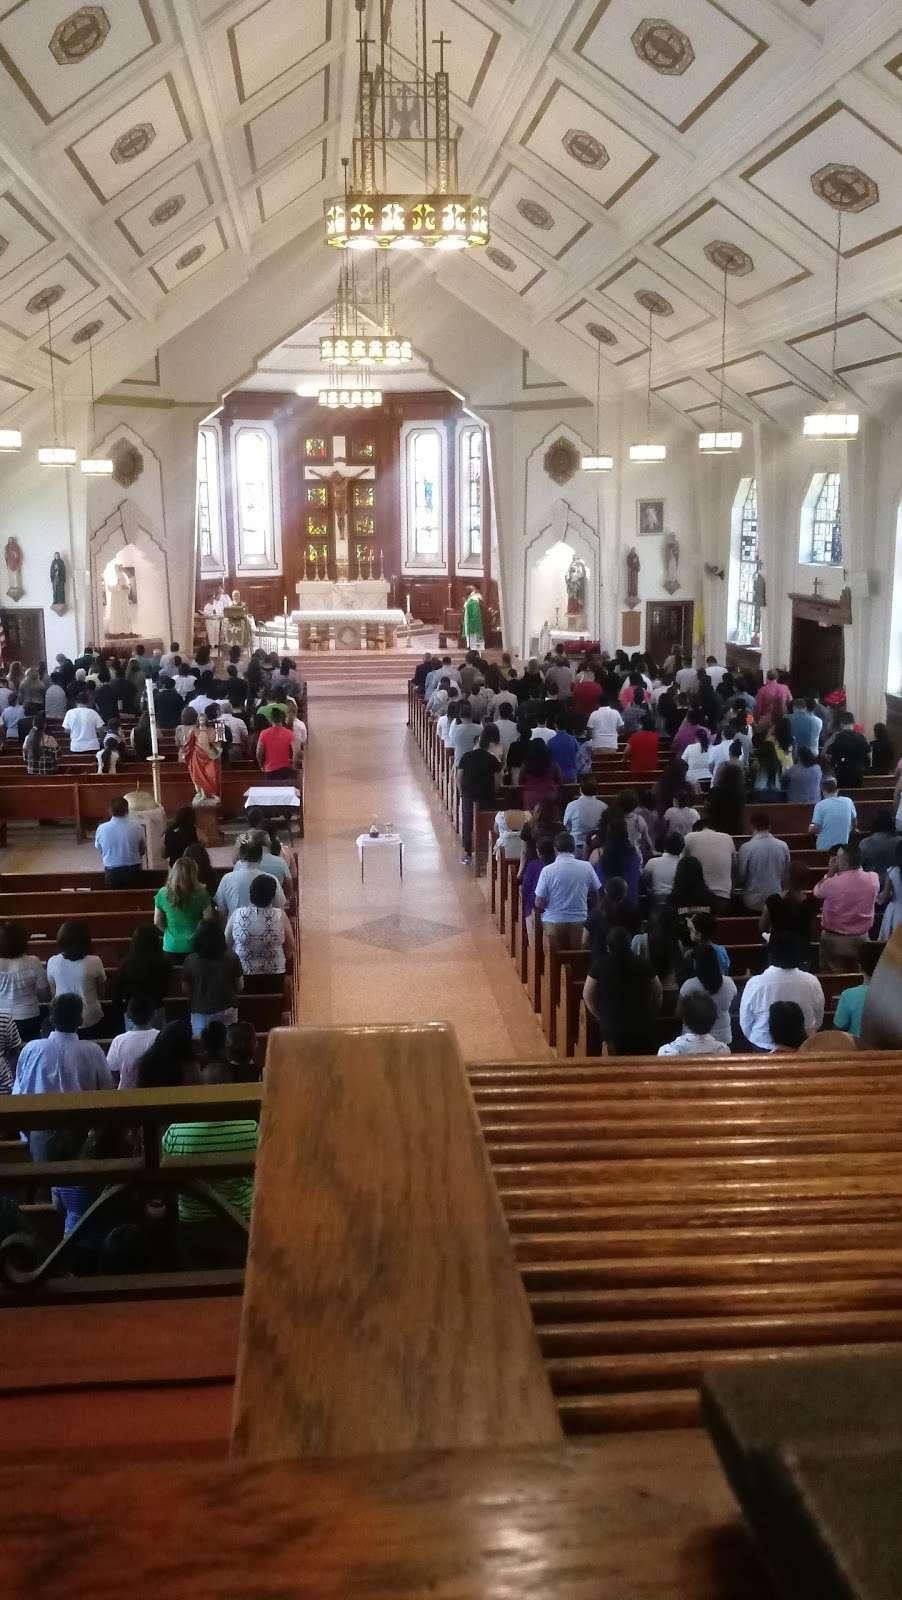 St Marys Winfield - church  | Photo 6 of 10 | Address: 70-31 48th Ave, Woodside, NY 11377, USA | Phone: (718) 672-4848